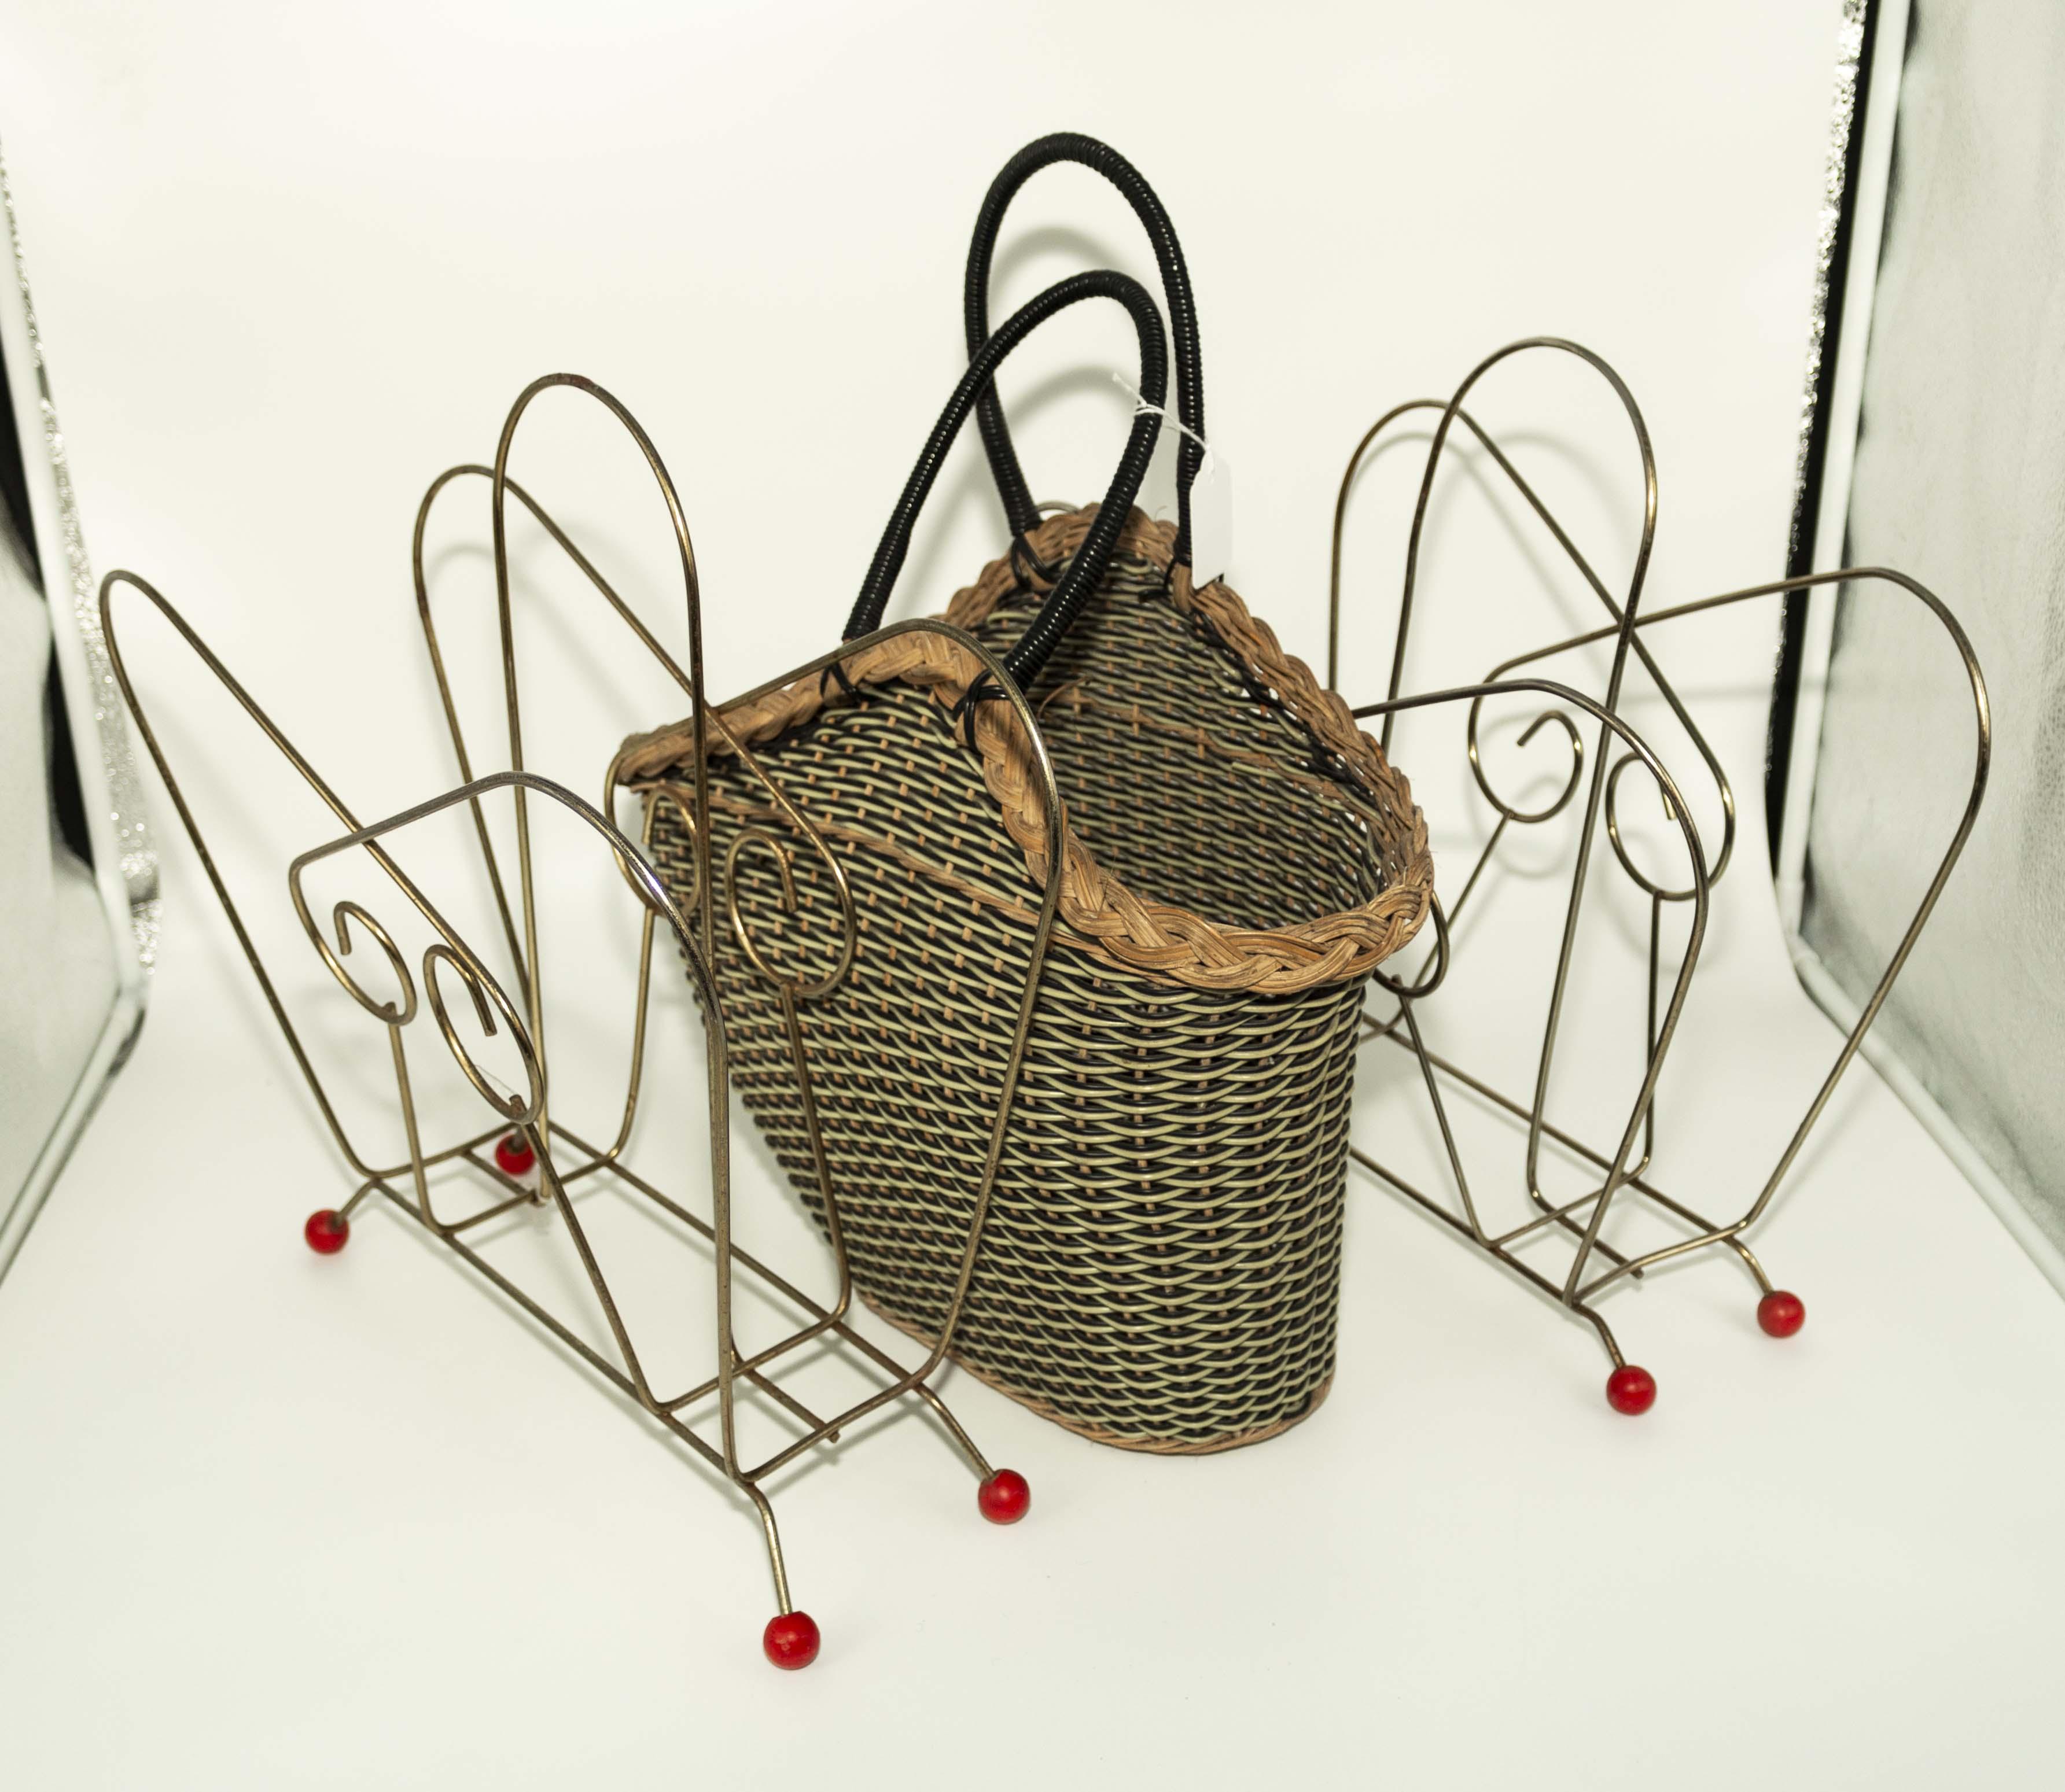 Lot 24 - Two vintage 1960's magazine racks and a basket